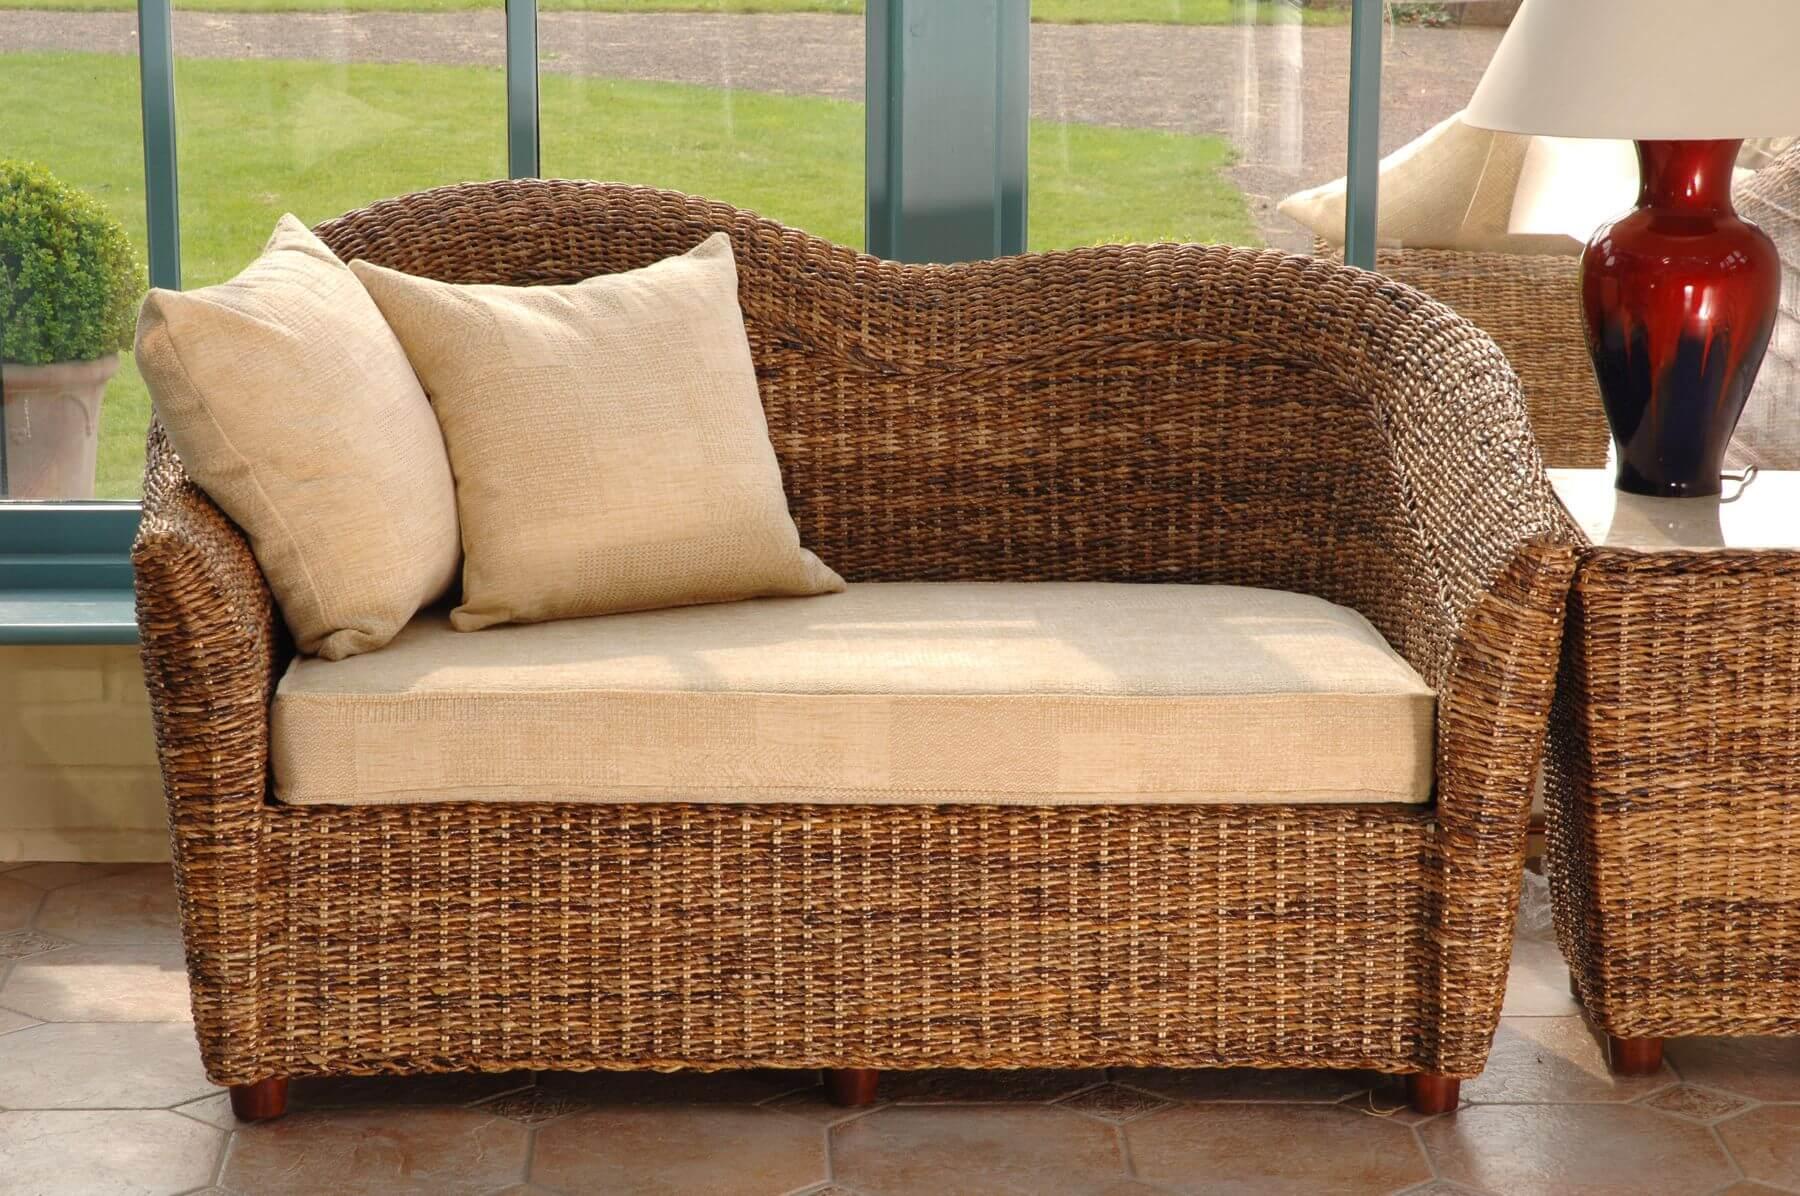 Conservatory Sofa Ideas - Wicker & Rattan Sofas